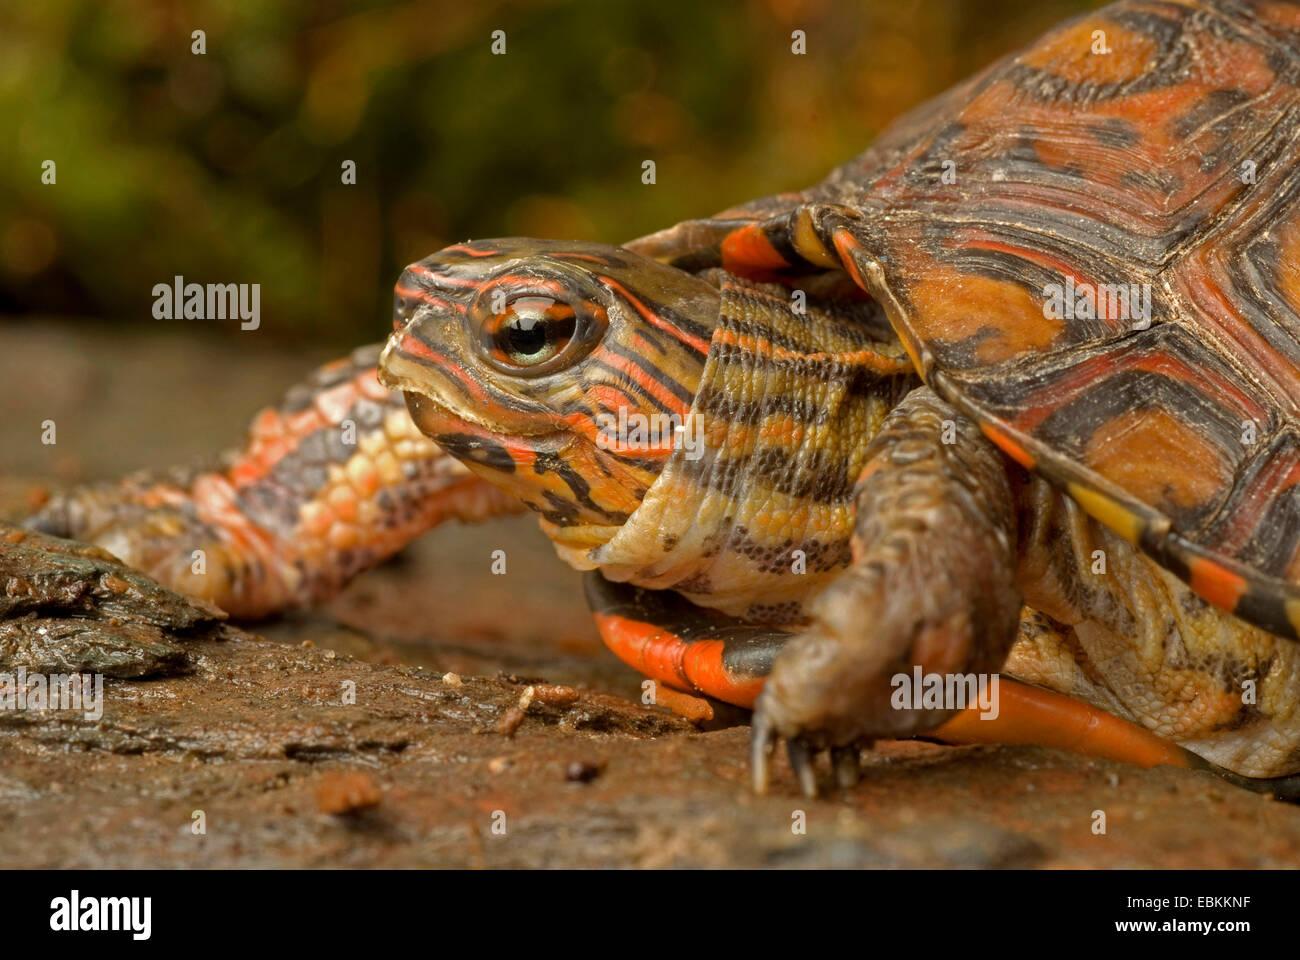 Costa Rica Painted wood turtle, Costa Rica Ornate wood turtle (Rhinoclemmys pulcherrima manni), portrait - Stock Image